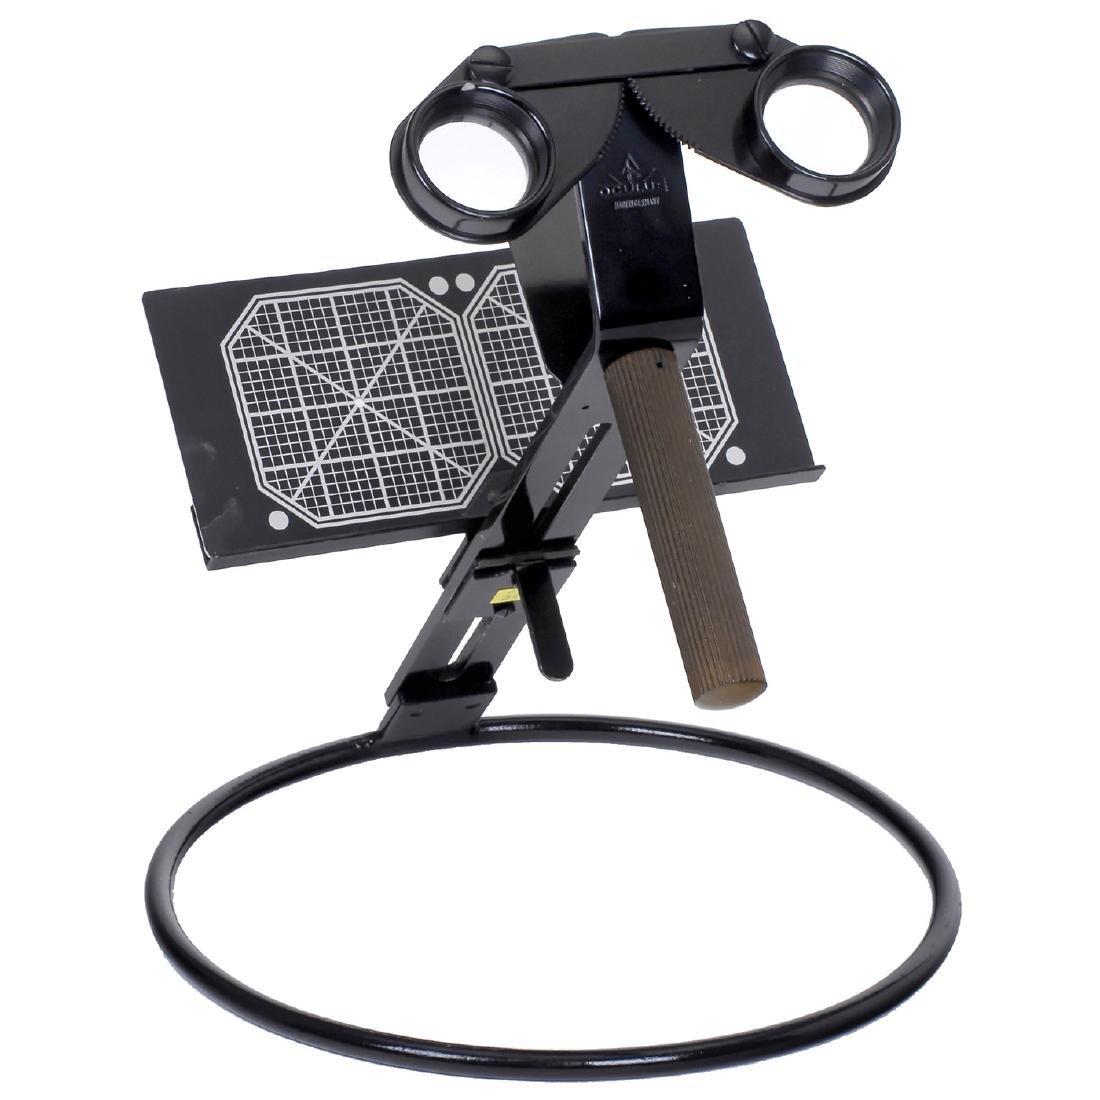 Oculus Stereoscope, c. 1925-30